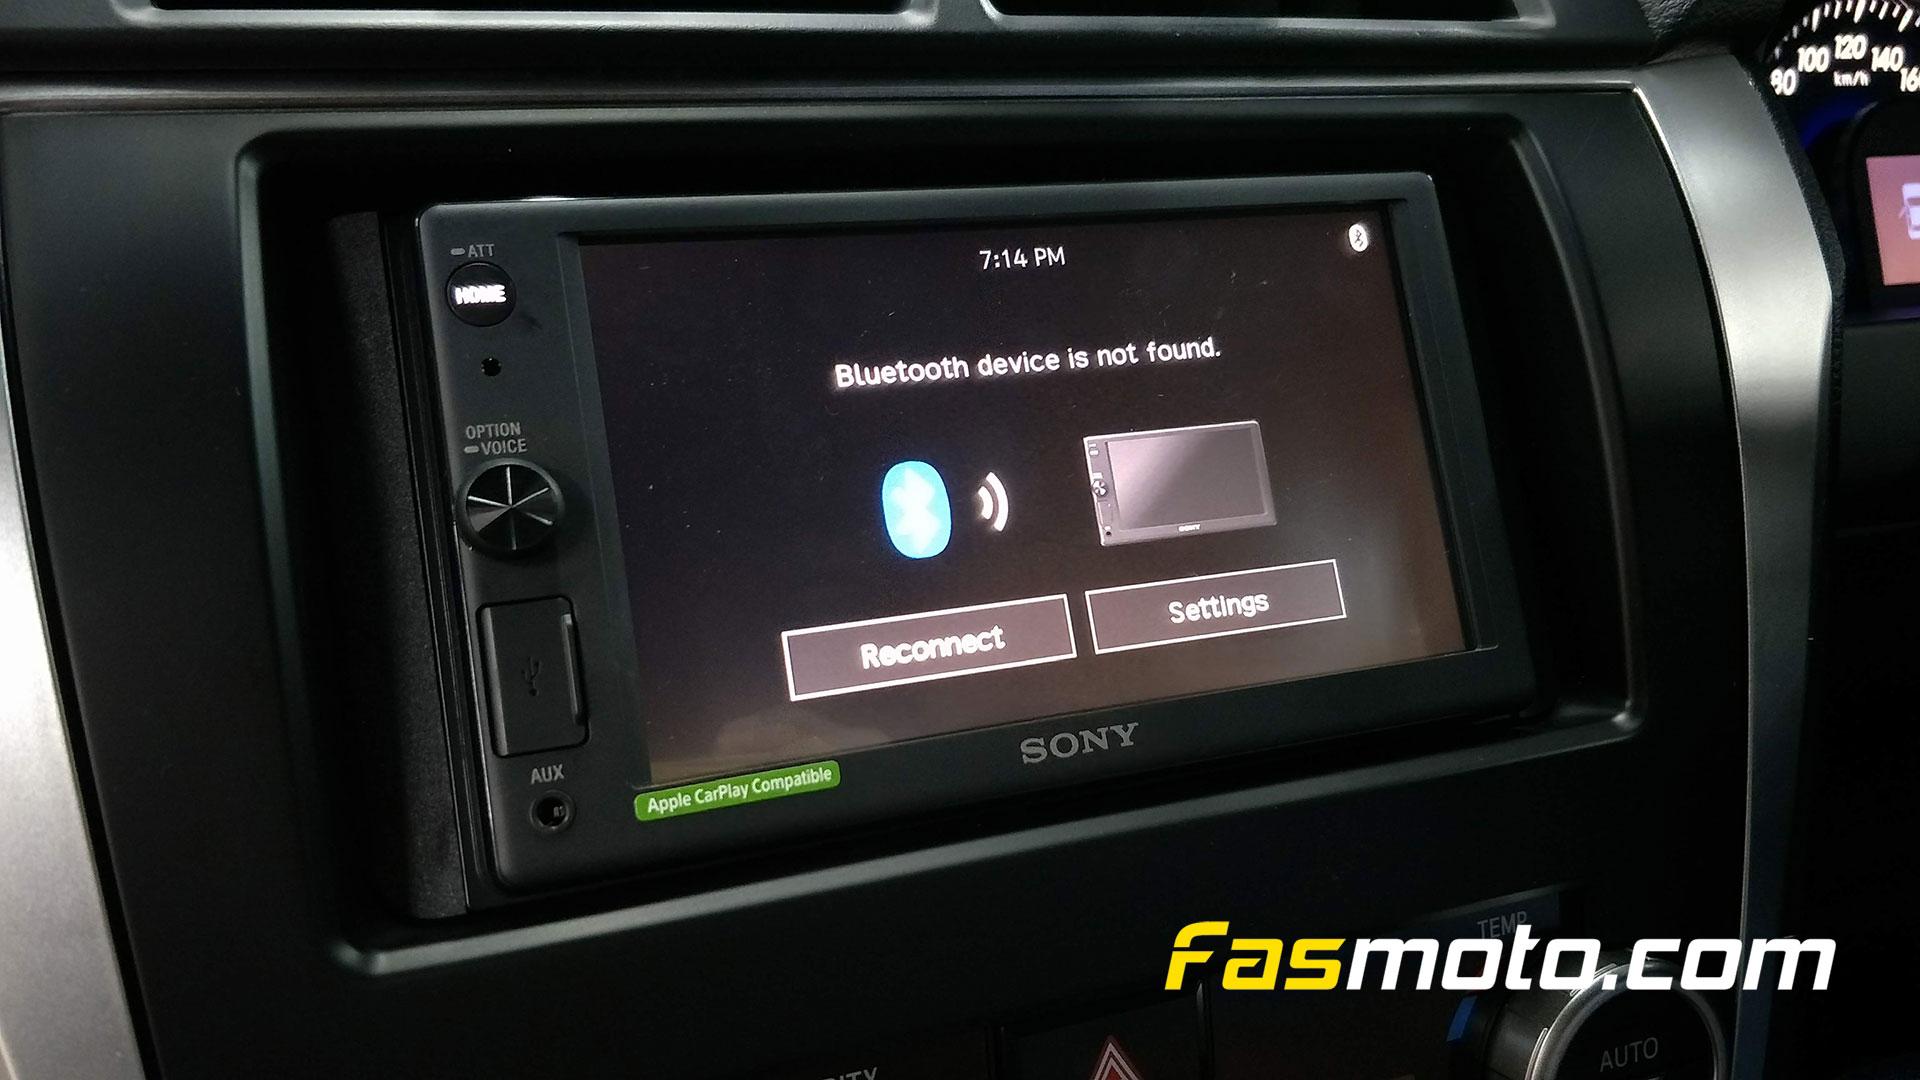 Sony XAV-AX1000 Bluetooth Connection Screen